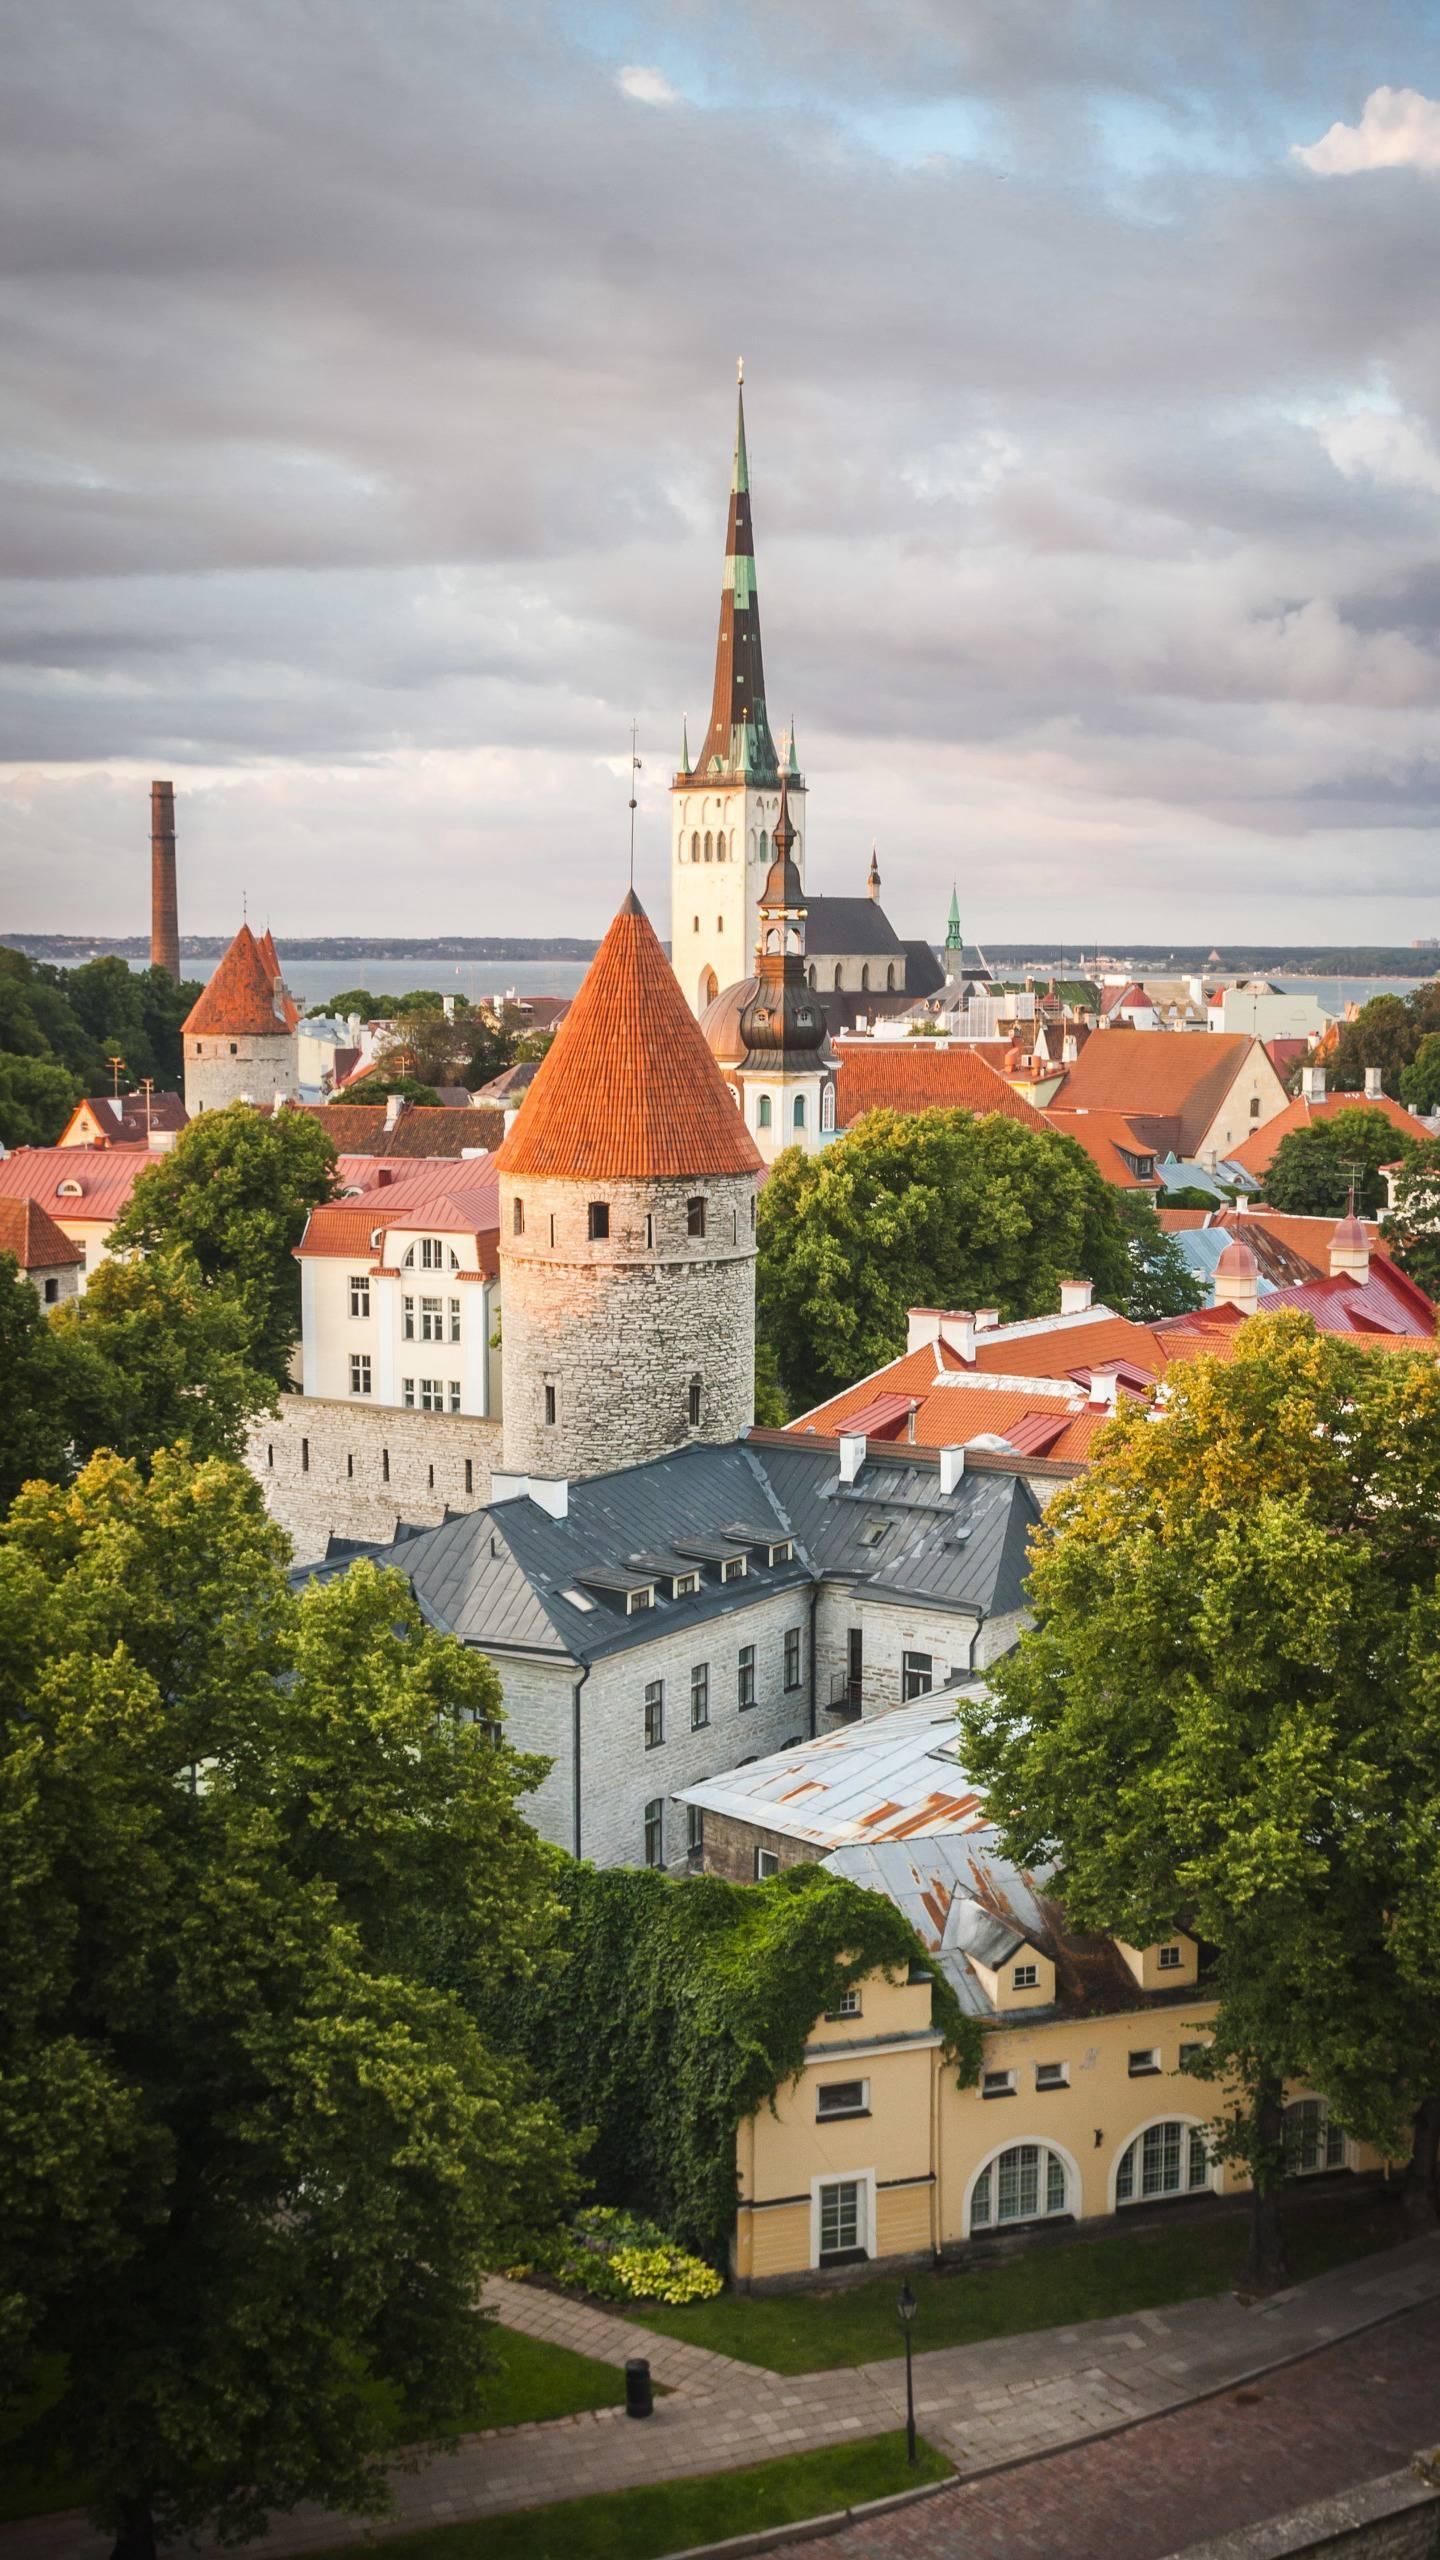 Tallinn, Estonia. Tallinn is located on the Baltic coast of northern Estonia, across the sea from the Finnish capital Helsinki.